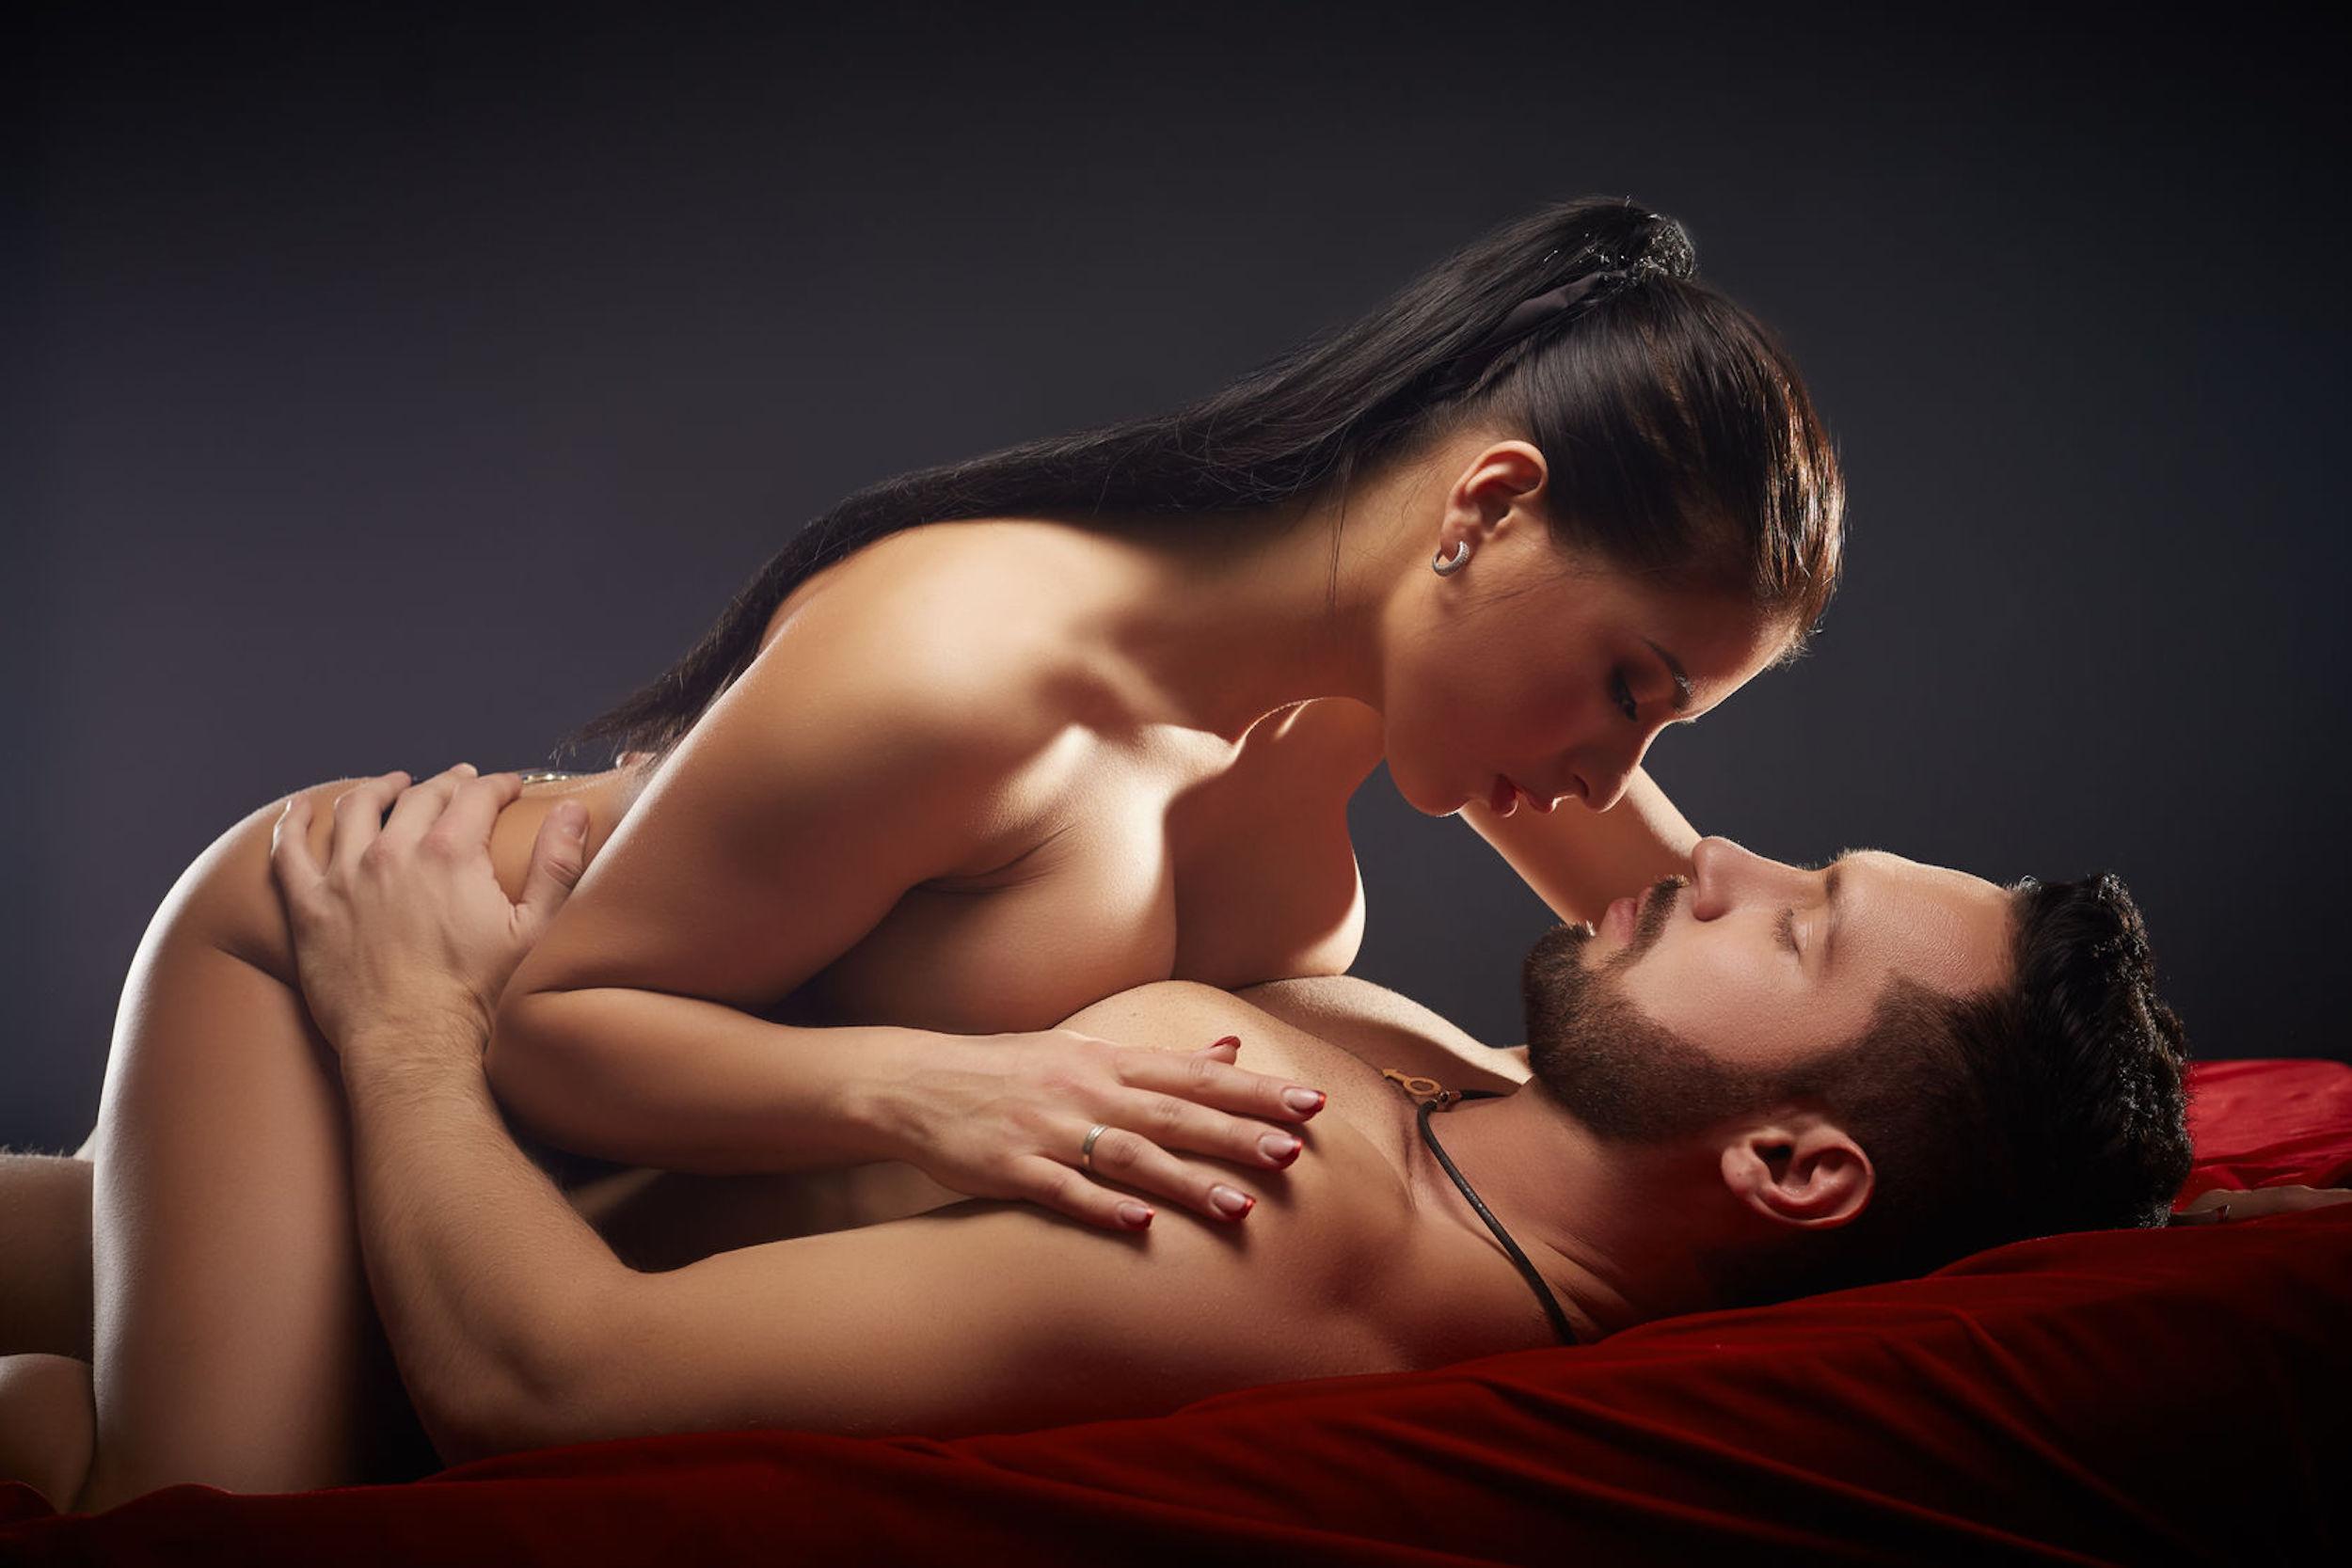 passionate couple having sex, close-up